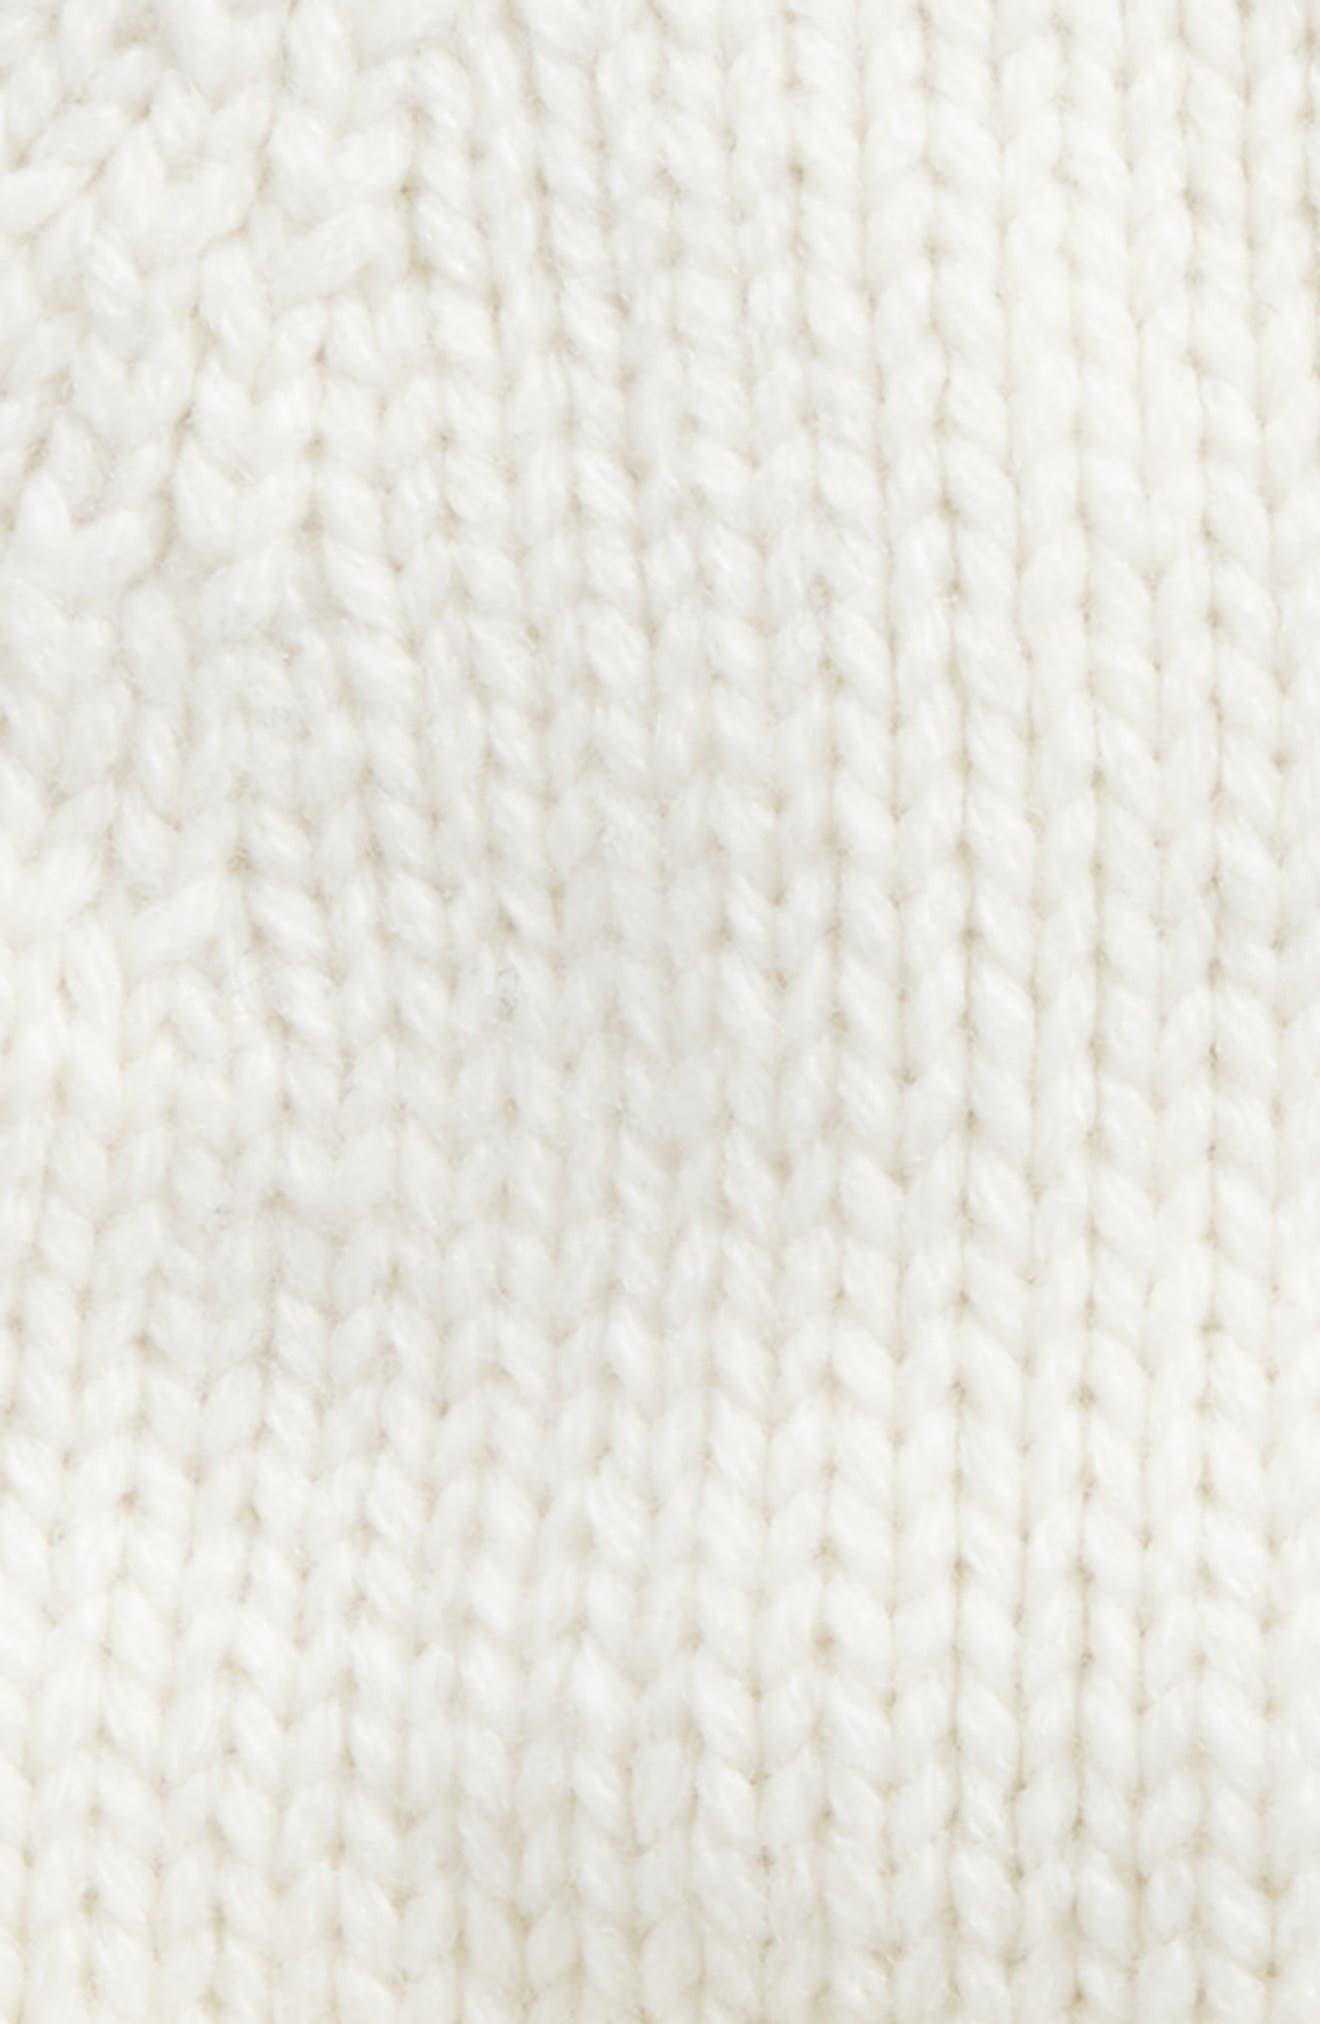 481efed20 Winking Beanie With Pom - White, Cream/ Black